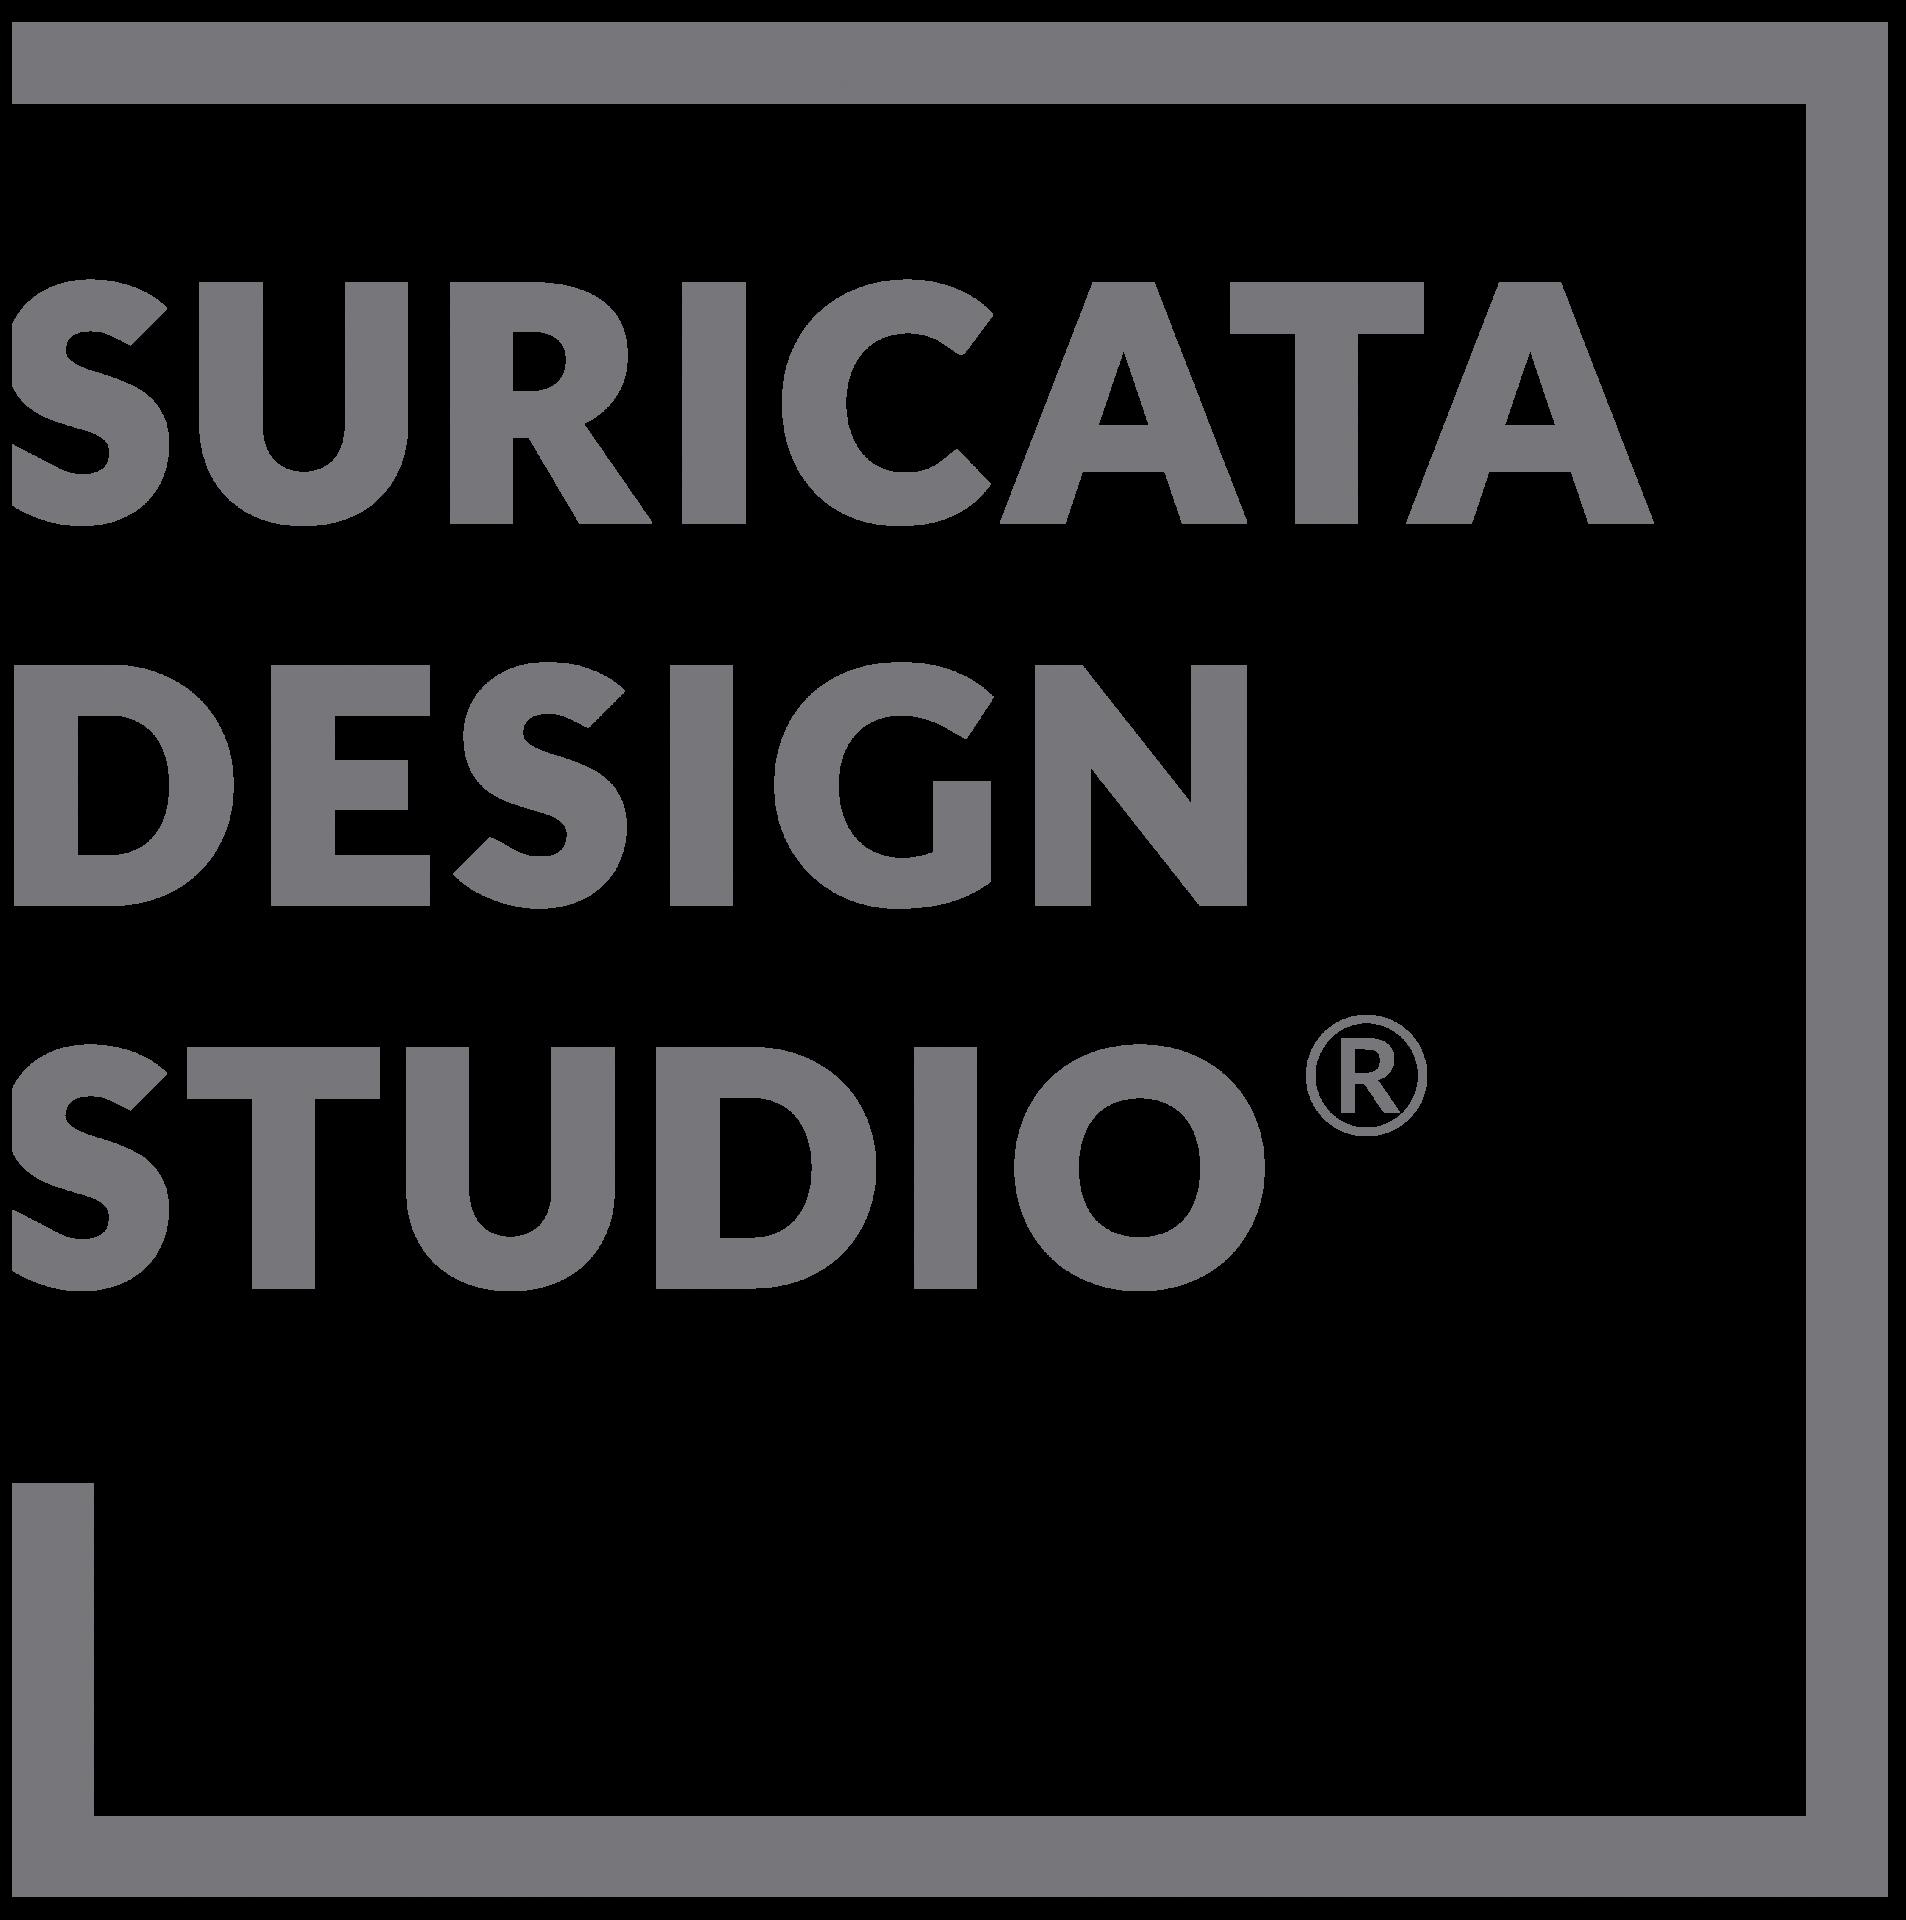 Suricata Design Studio